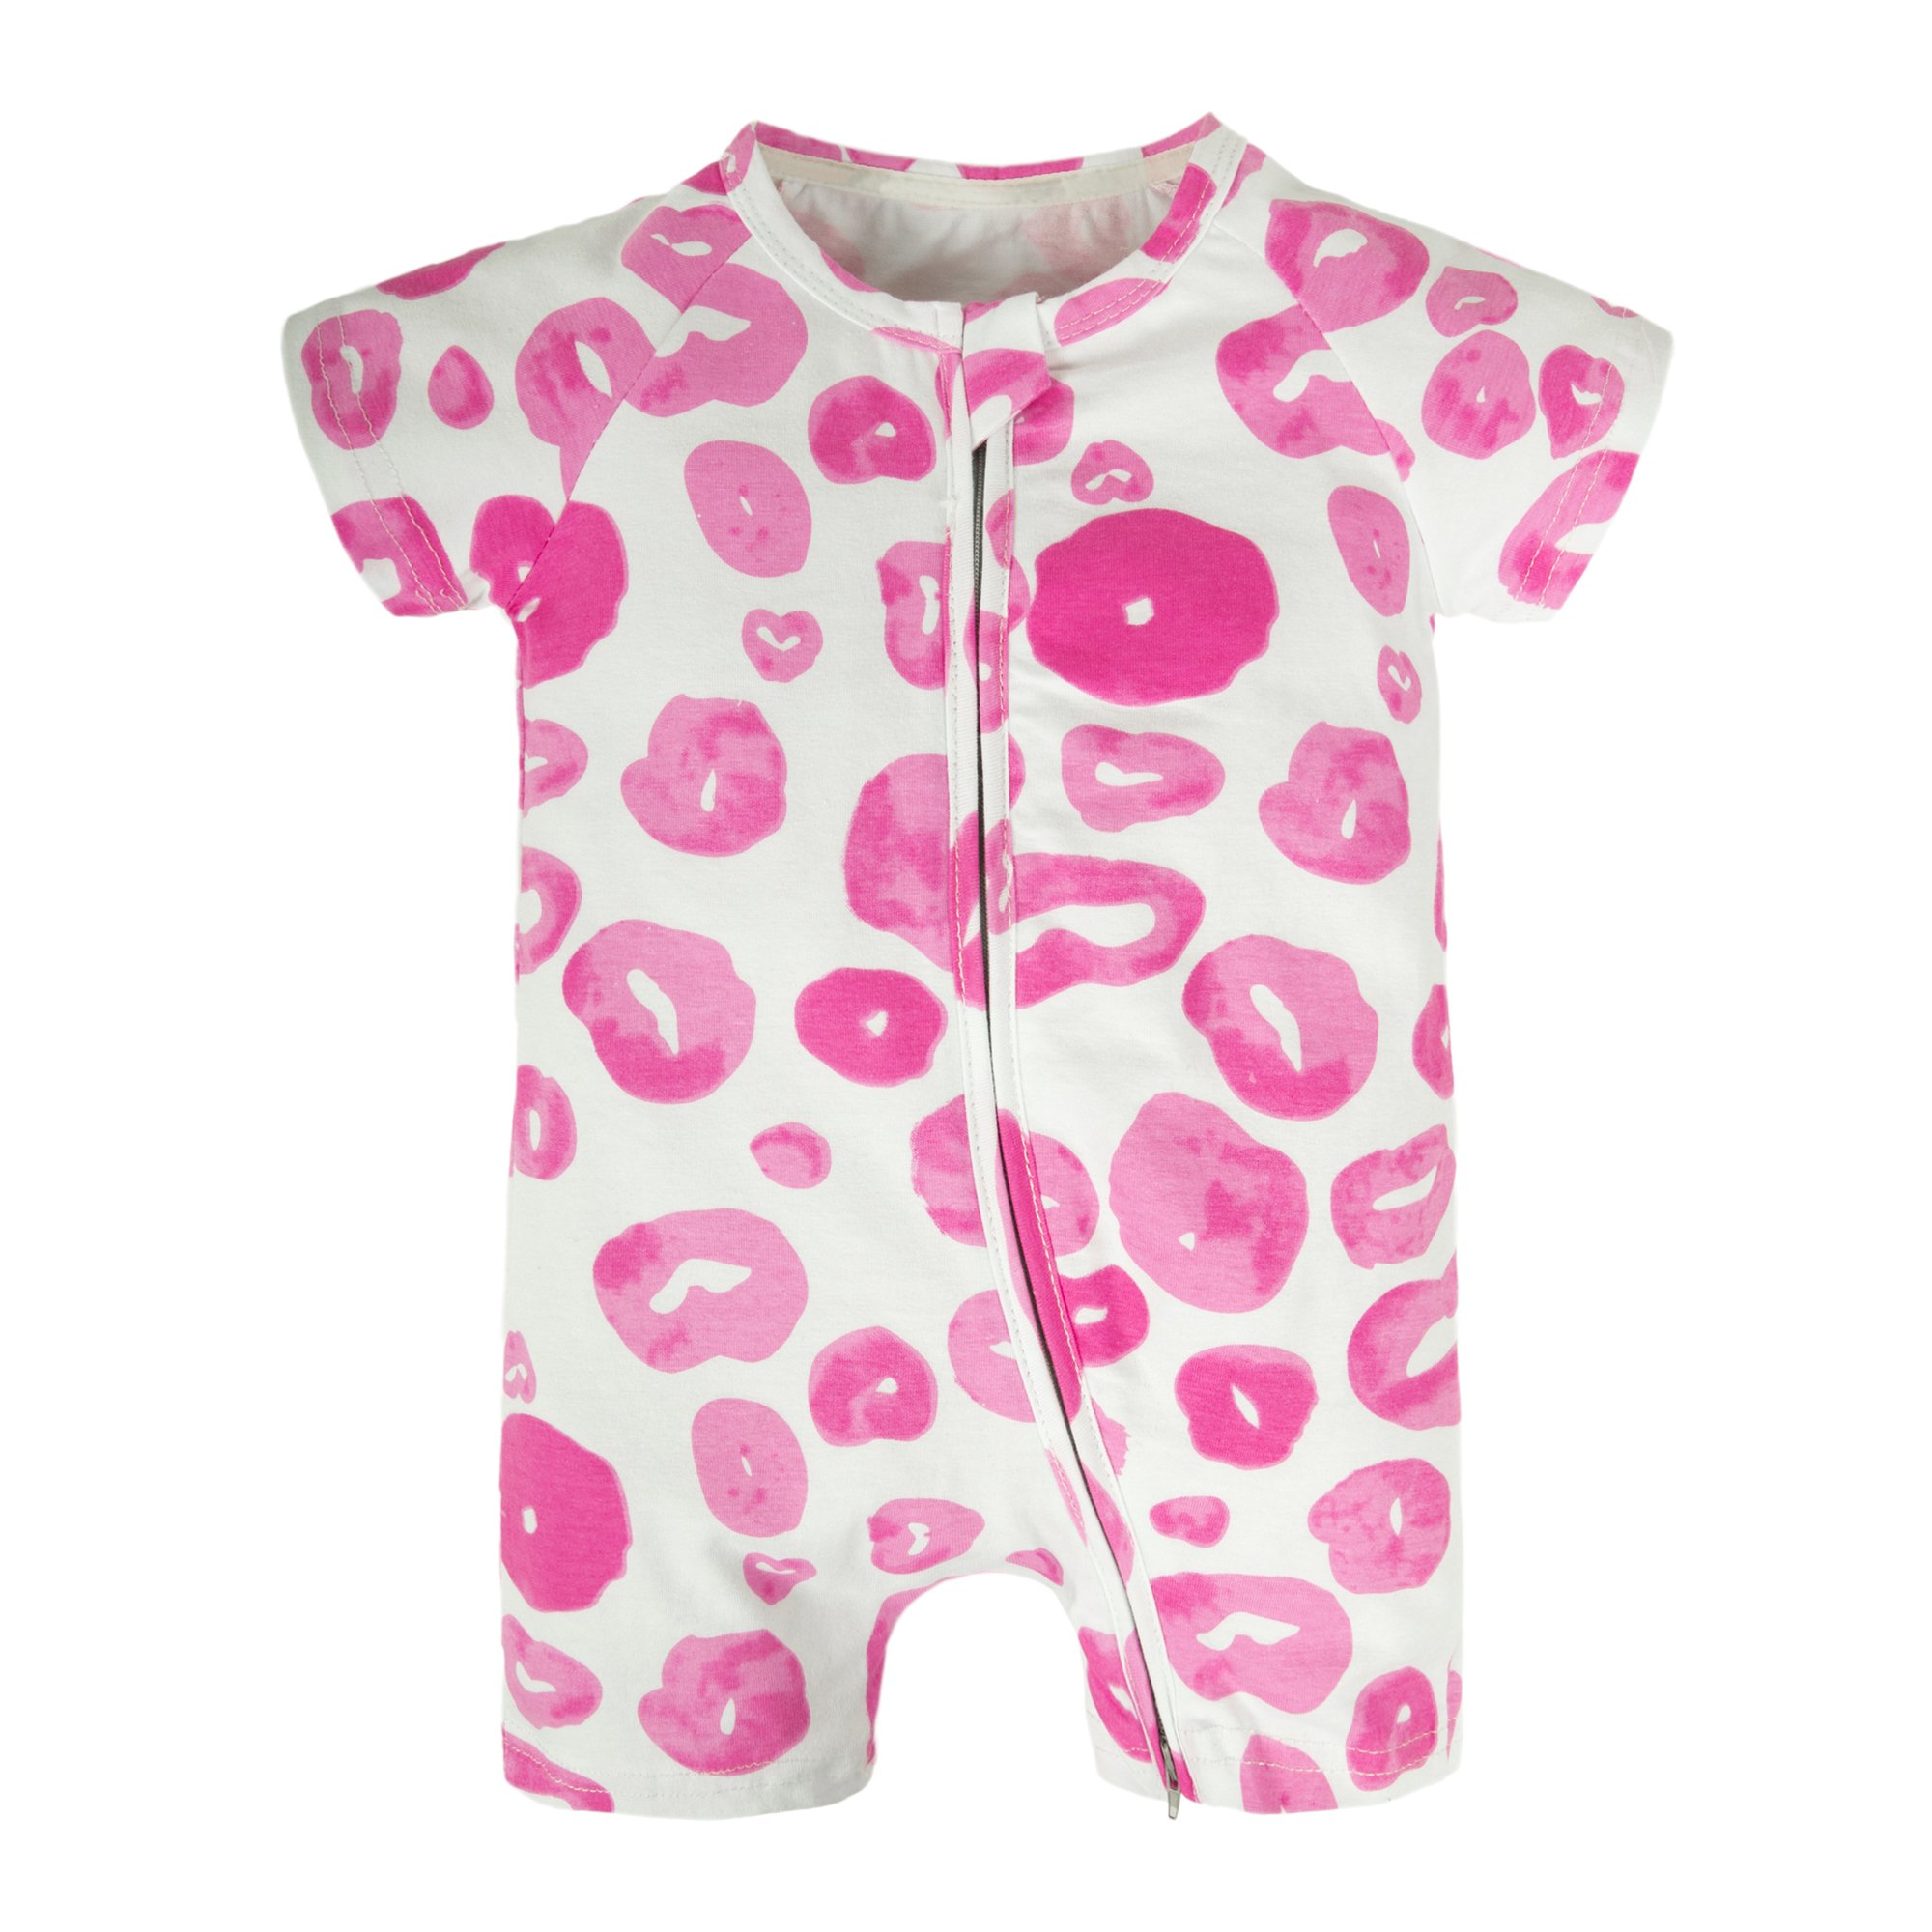 BIG ELEPHANT Baby Girls'1 Piece Summer Short Sleeve Pajama Graphic Zipper Romper Style D T98-73 6-9 Months